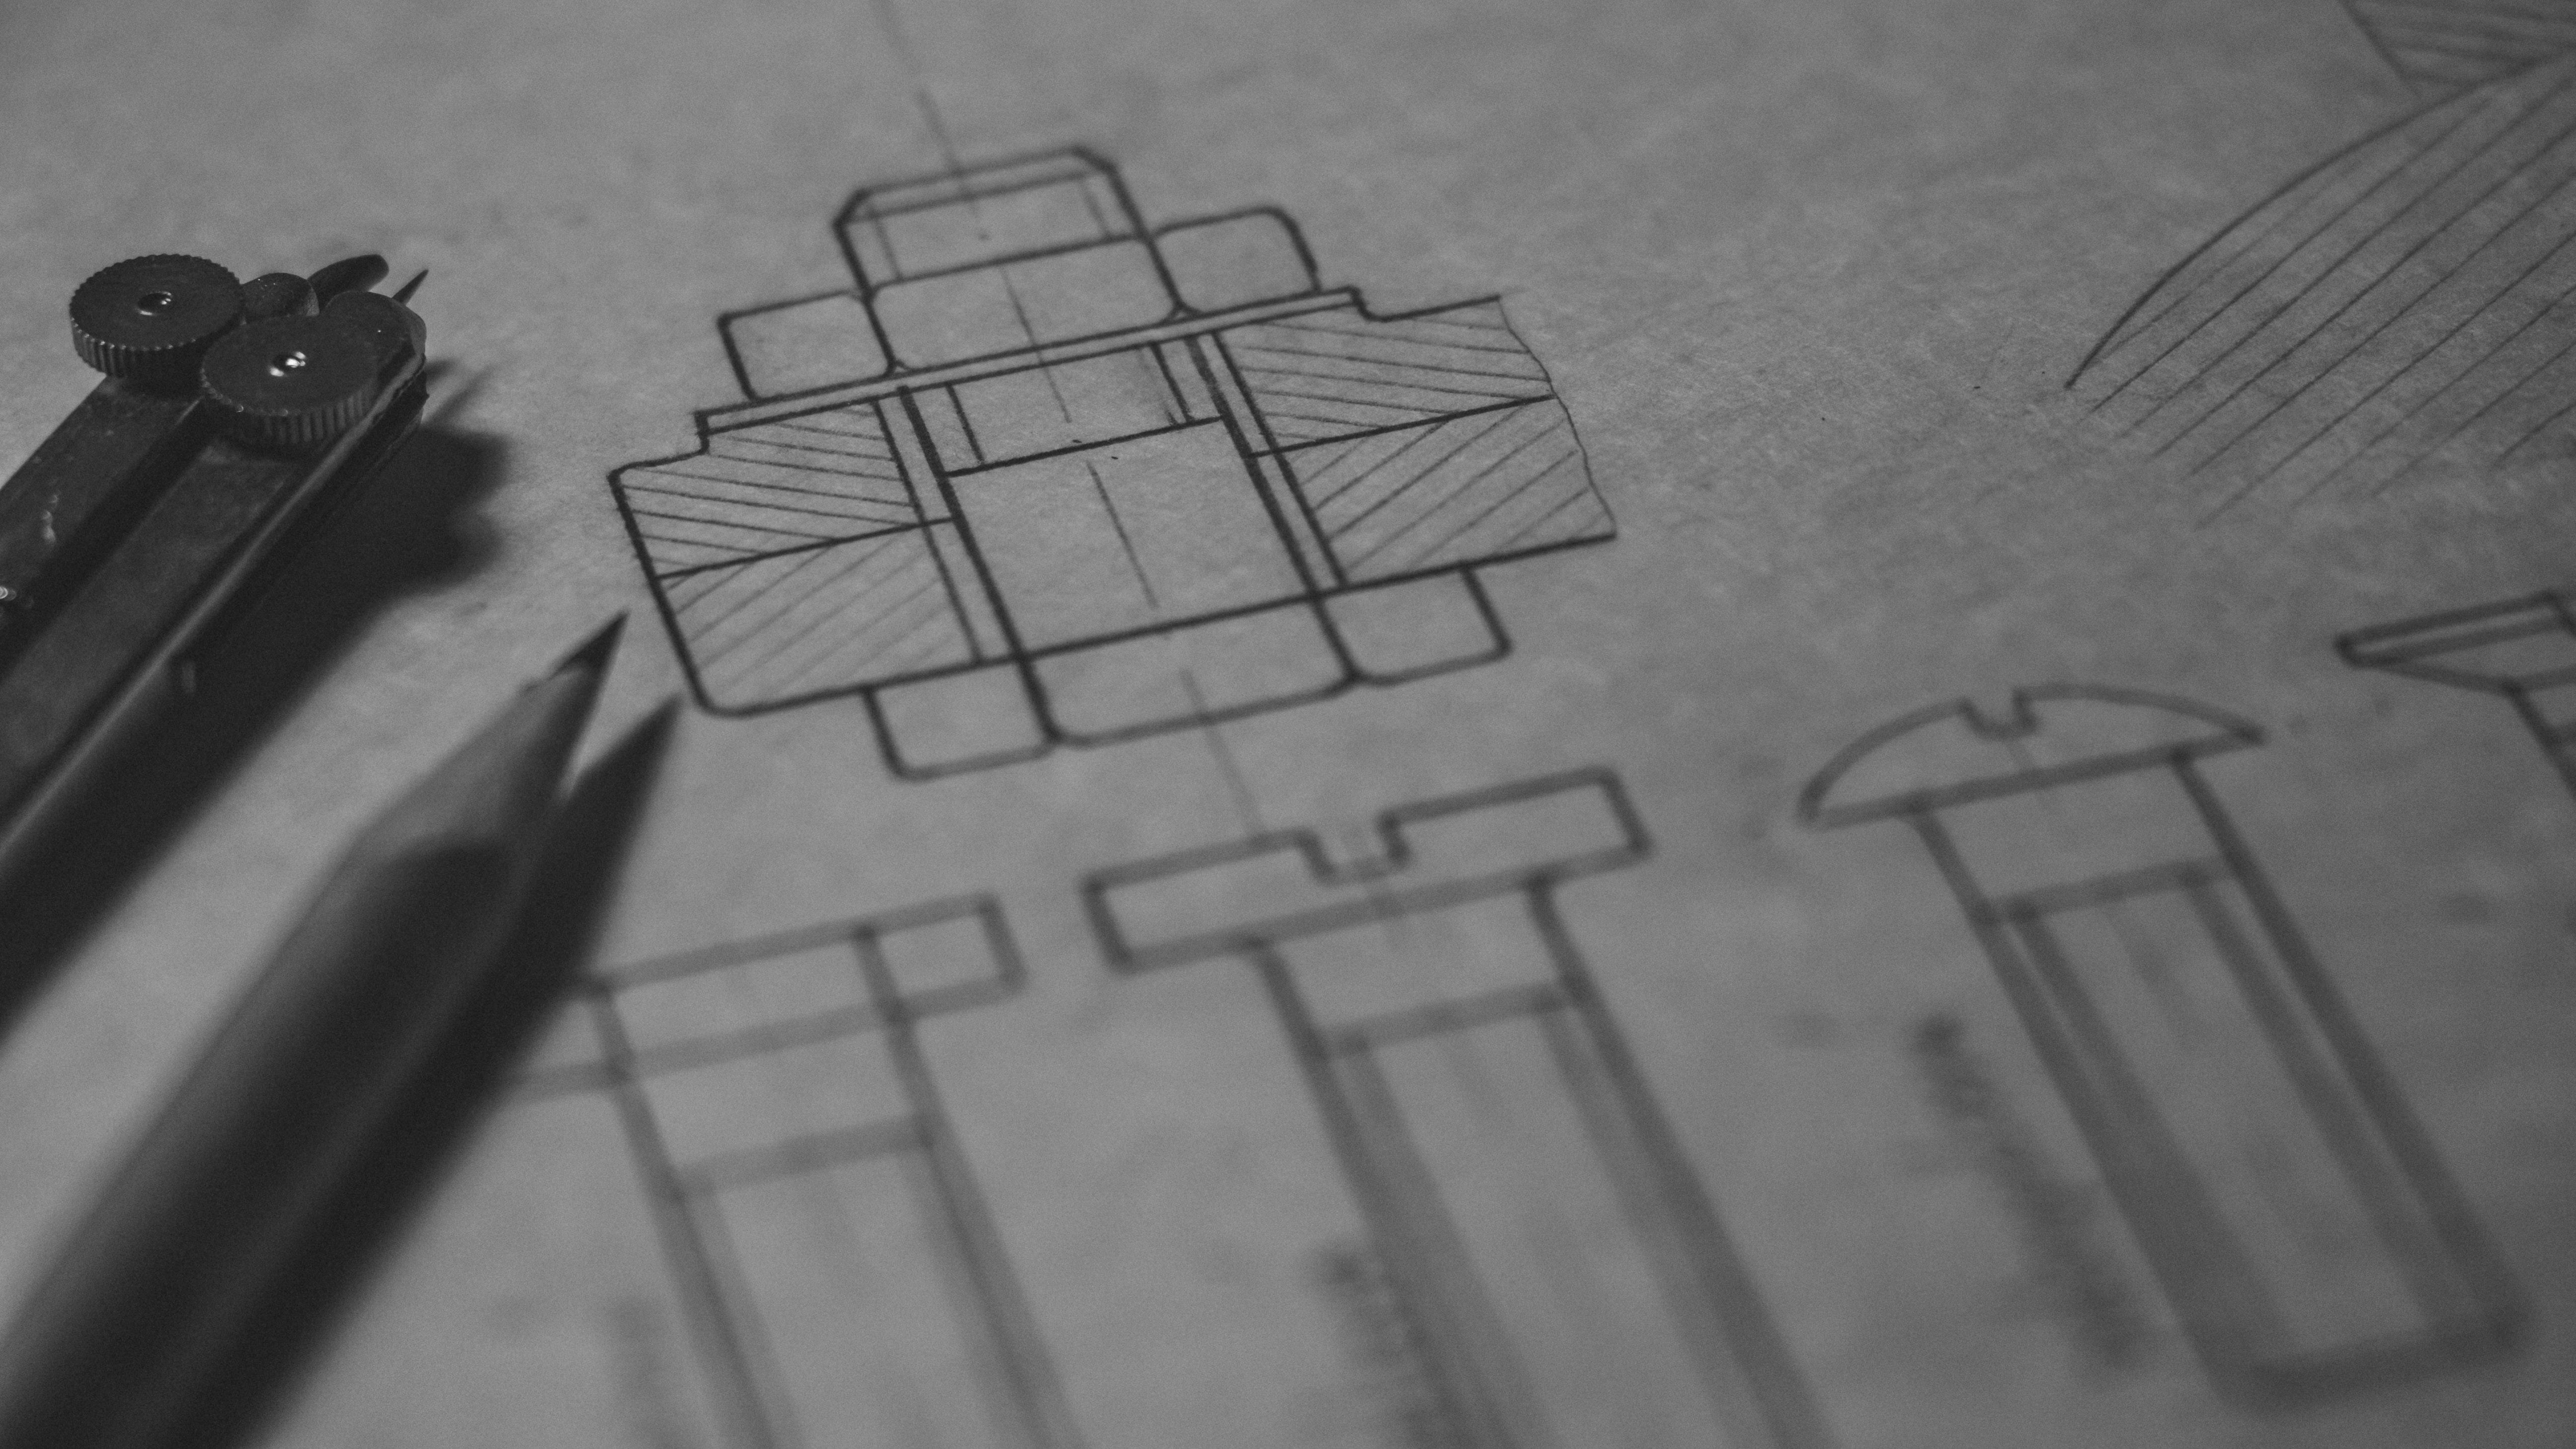 Black Illustration on White Printer Paper, Black and white, Blueprint, Blur, Close-up, HQ Photo